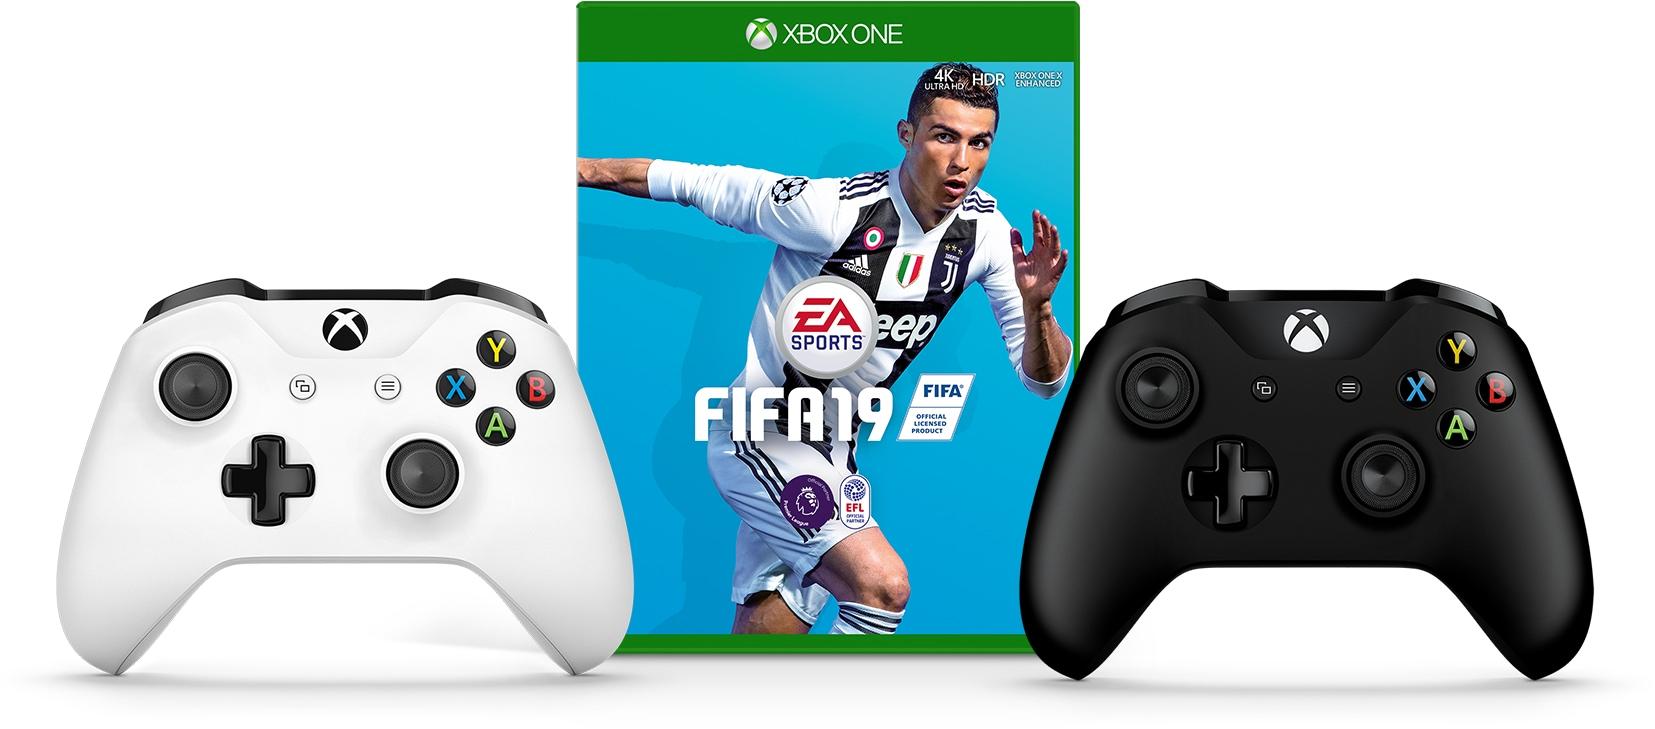 FIFA 19, Xbox Wireless Controller - Black, Xbox Wireless Controller - White